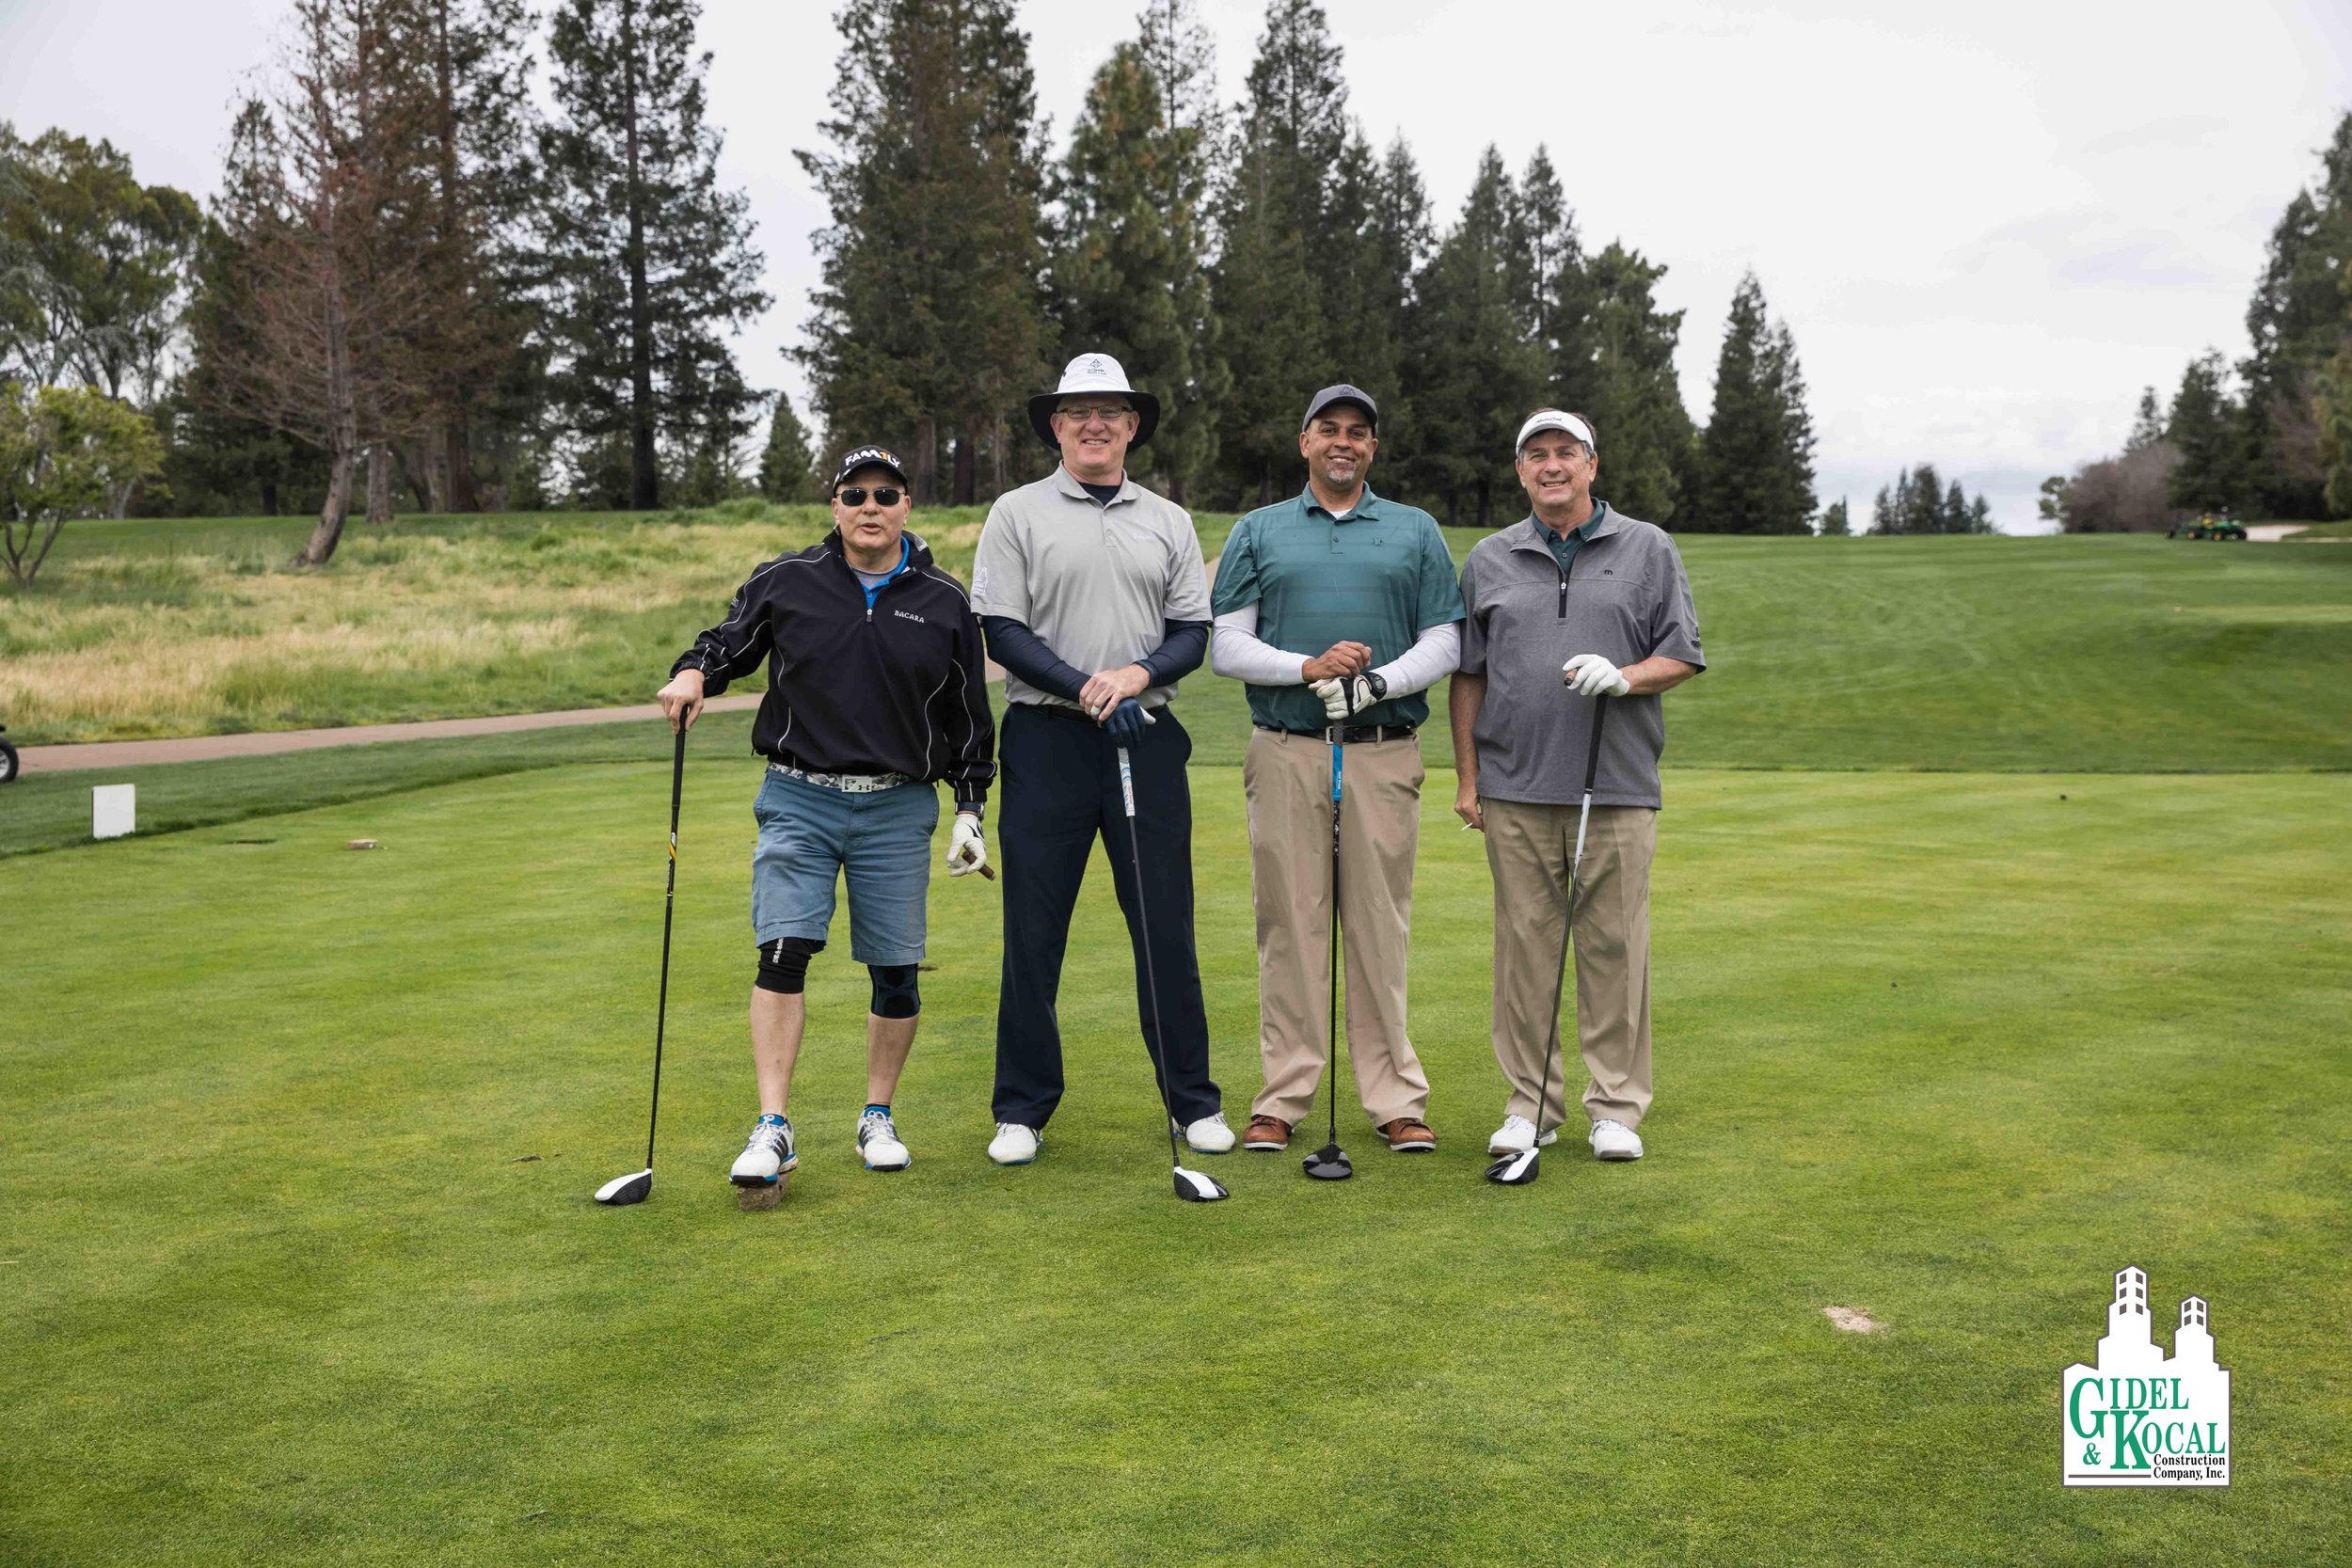 2017-04-17_GK_Golf_DBAPIX-236_LORES.jpg